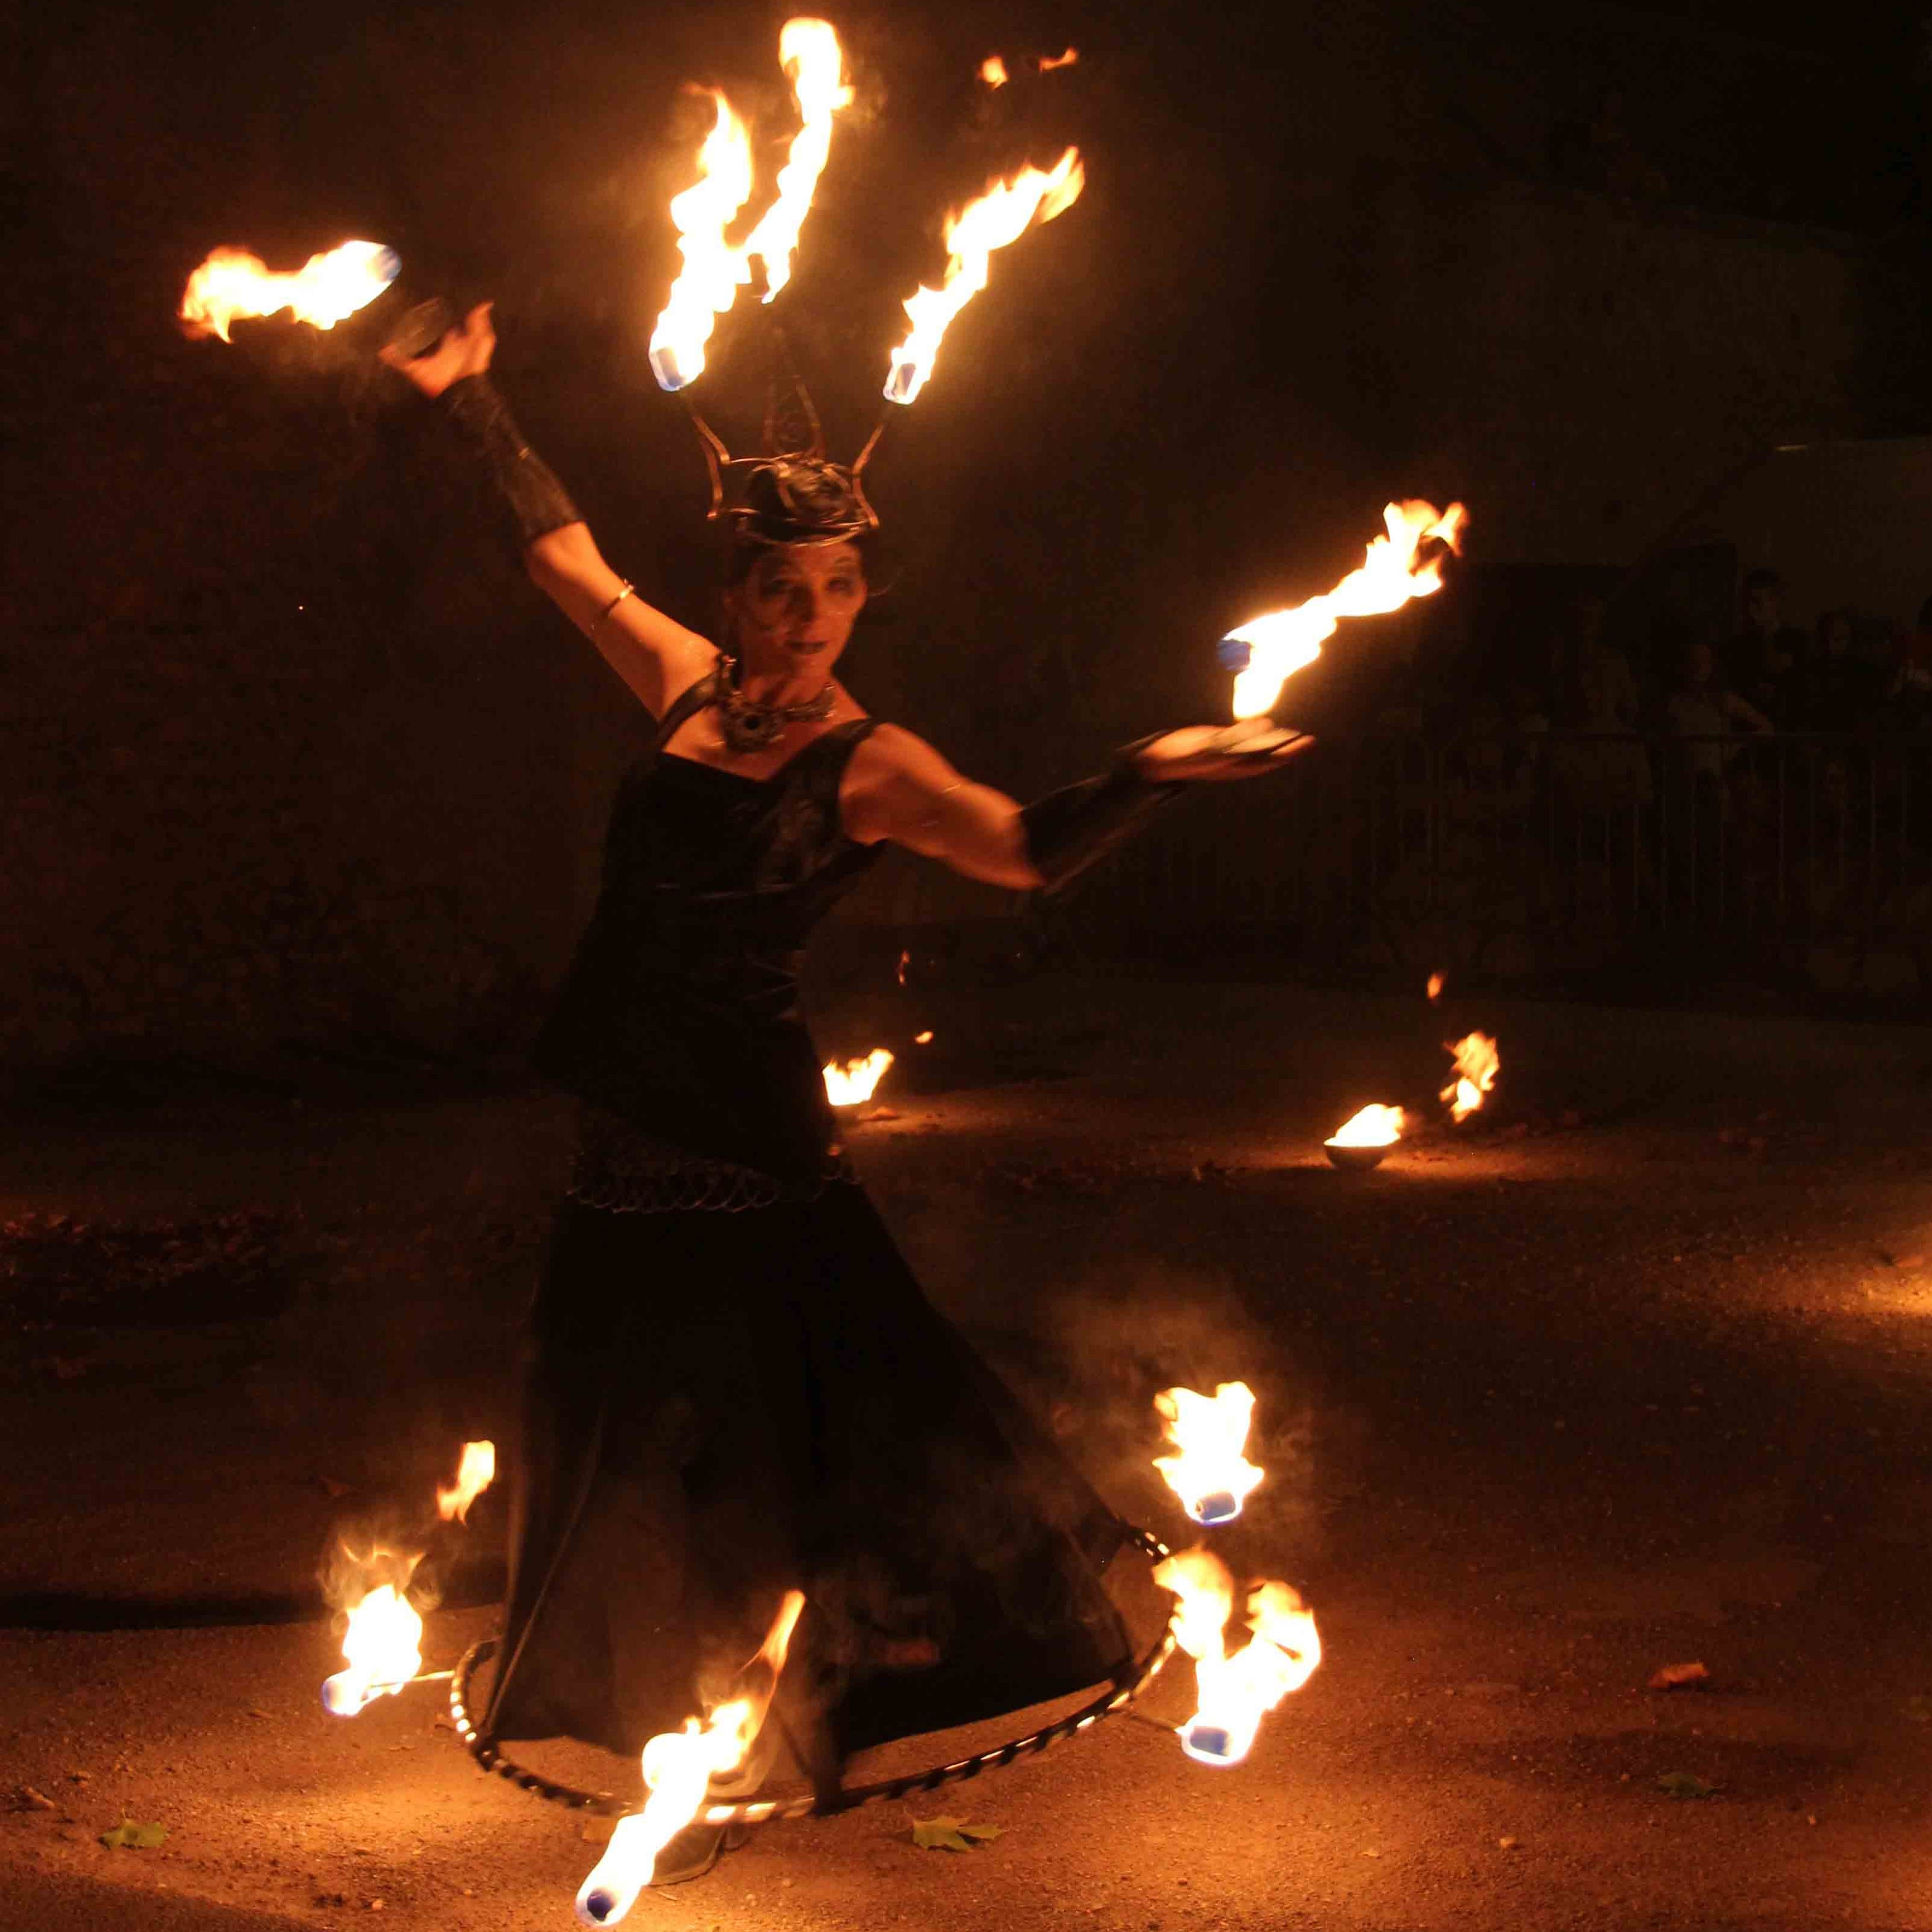 danse-robe-de-feu-spectacle-de-feu-e1505743813822